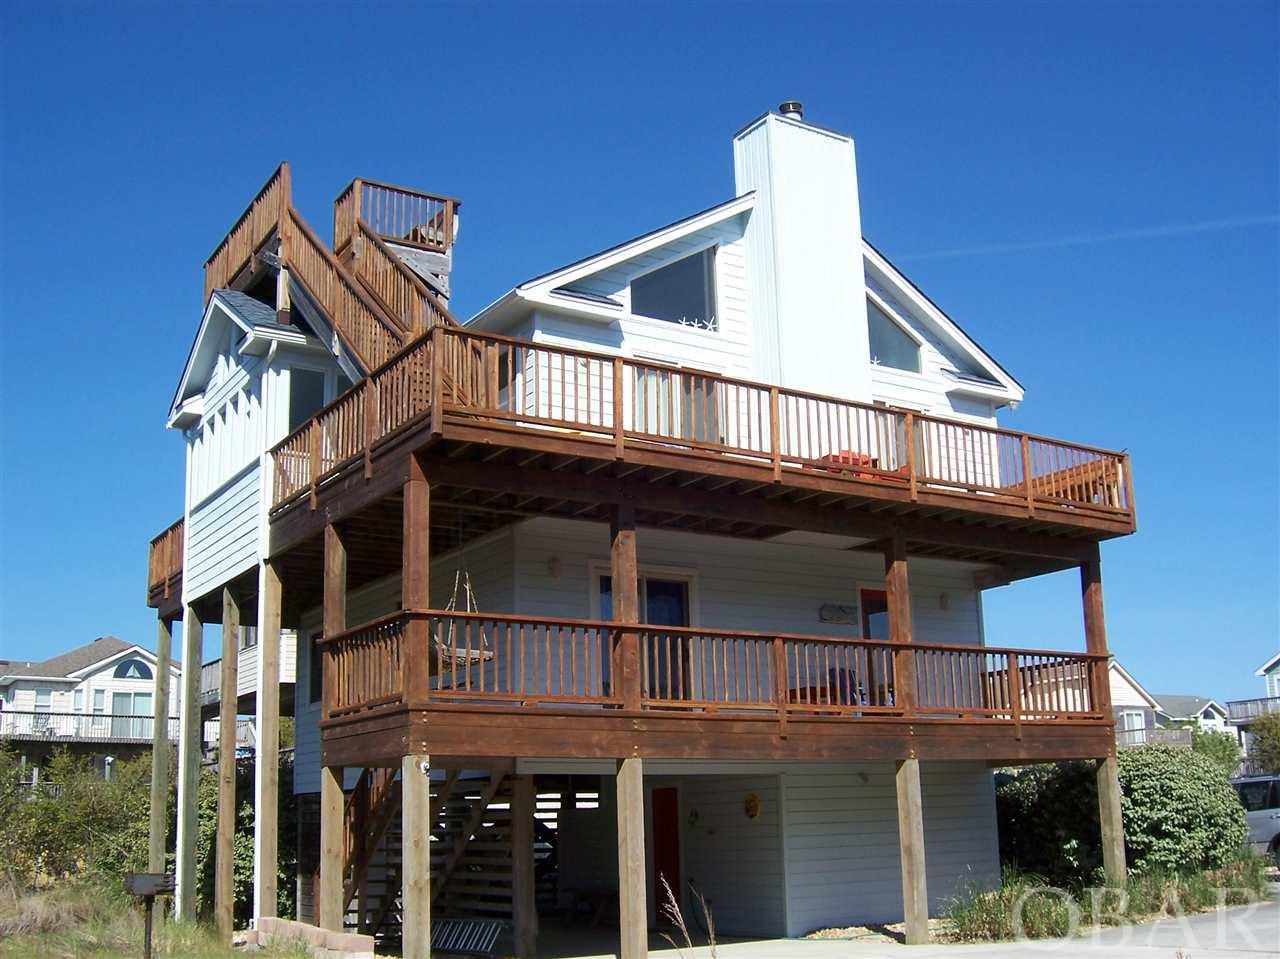 762 Lakeshore Court Lot #32, Corolla, NC 27927 US Outer Banks Home